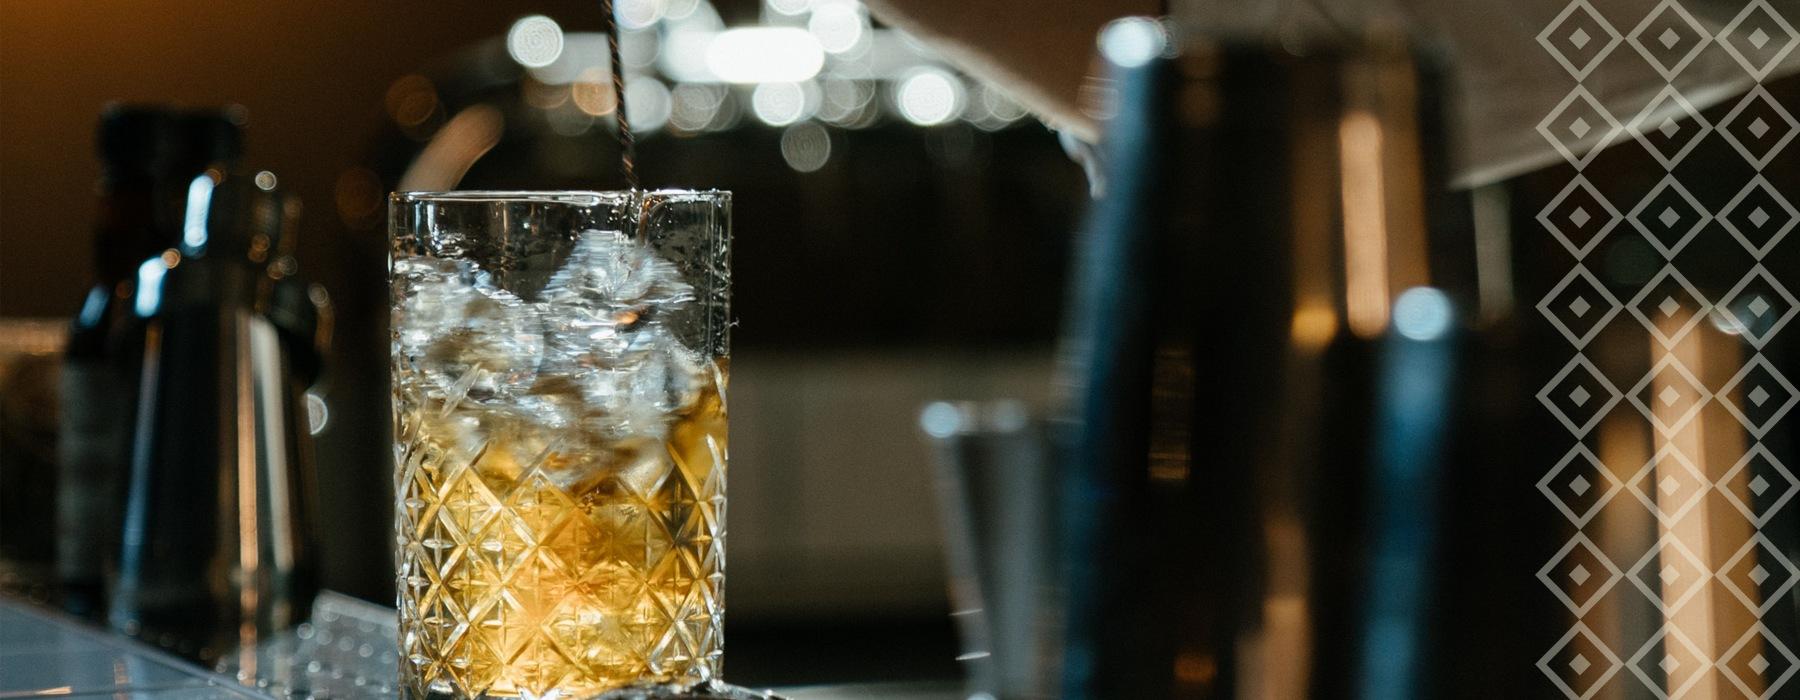 cocktail stirring at local bar